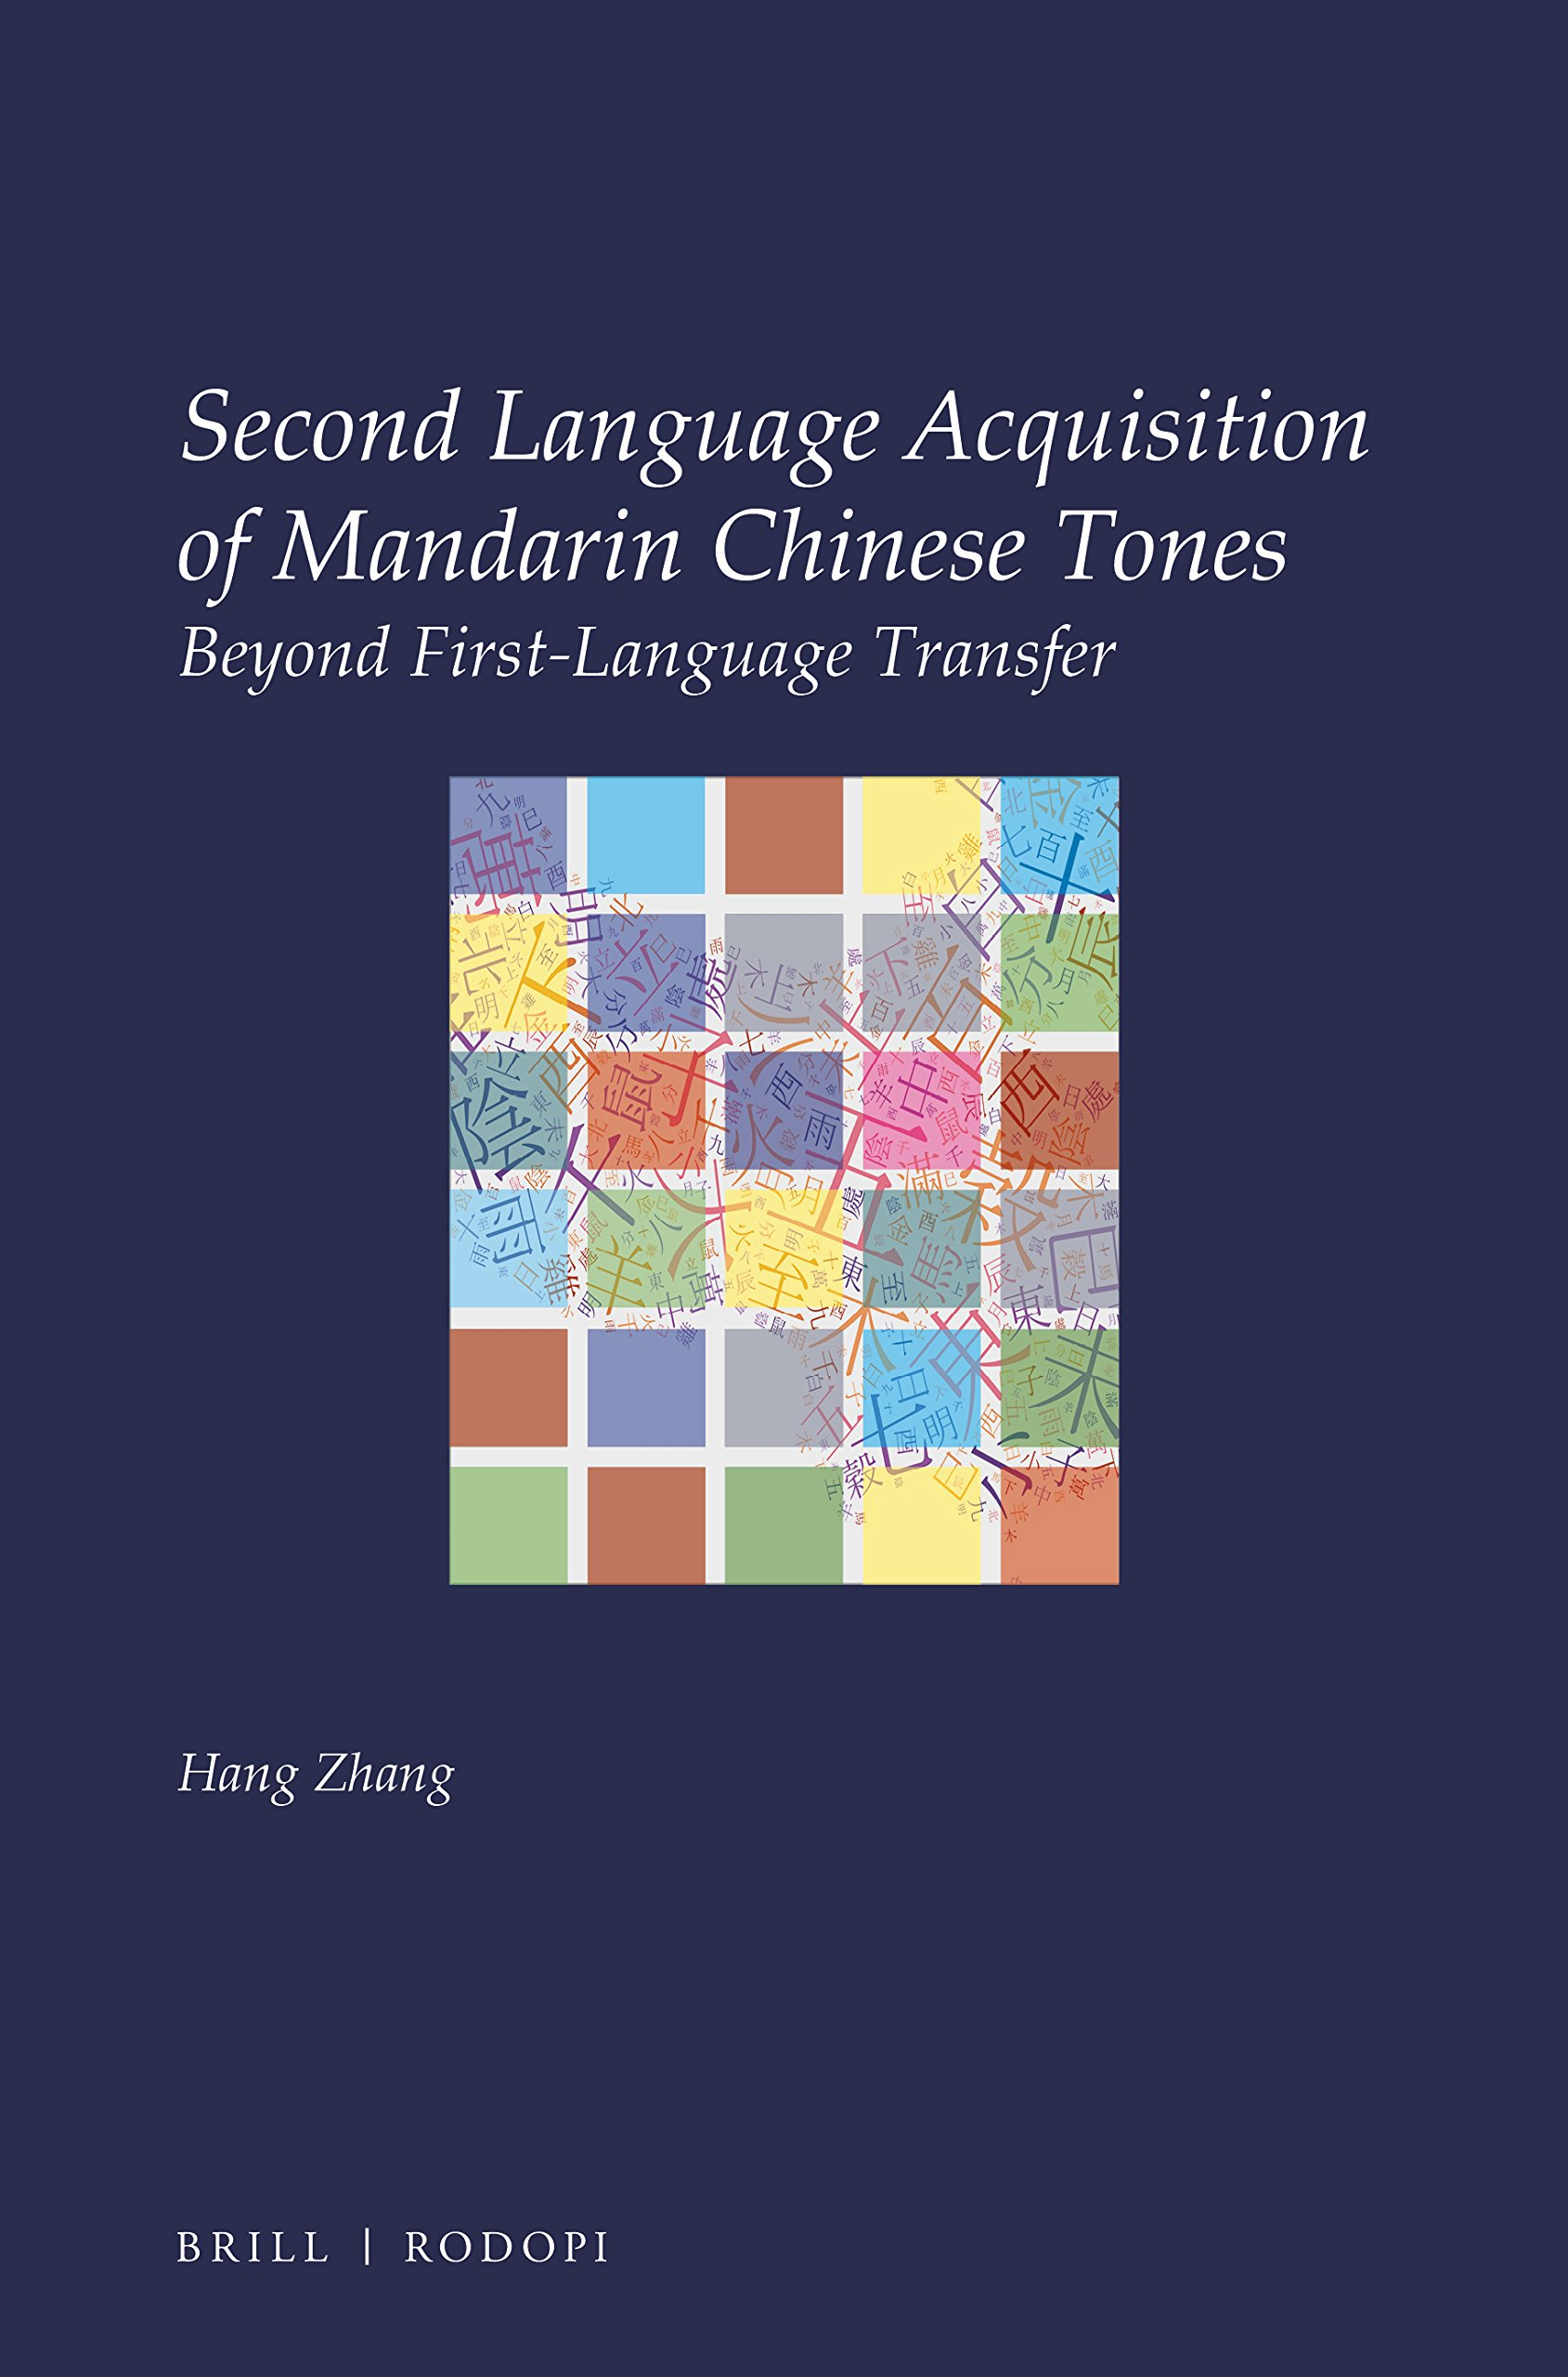 Second Language Acquisition of Mandarin Chinese Tones (Utrecht Studies in Language and Communication) PDF